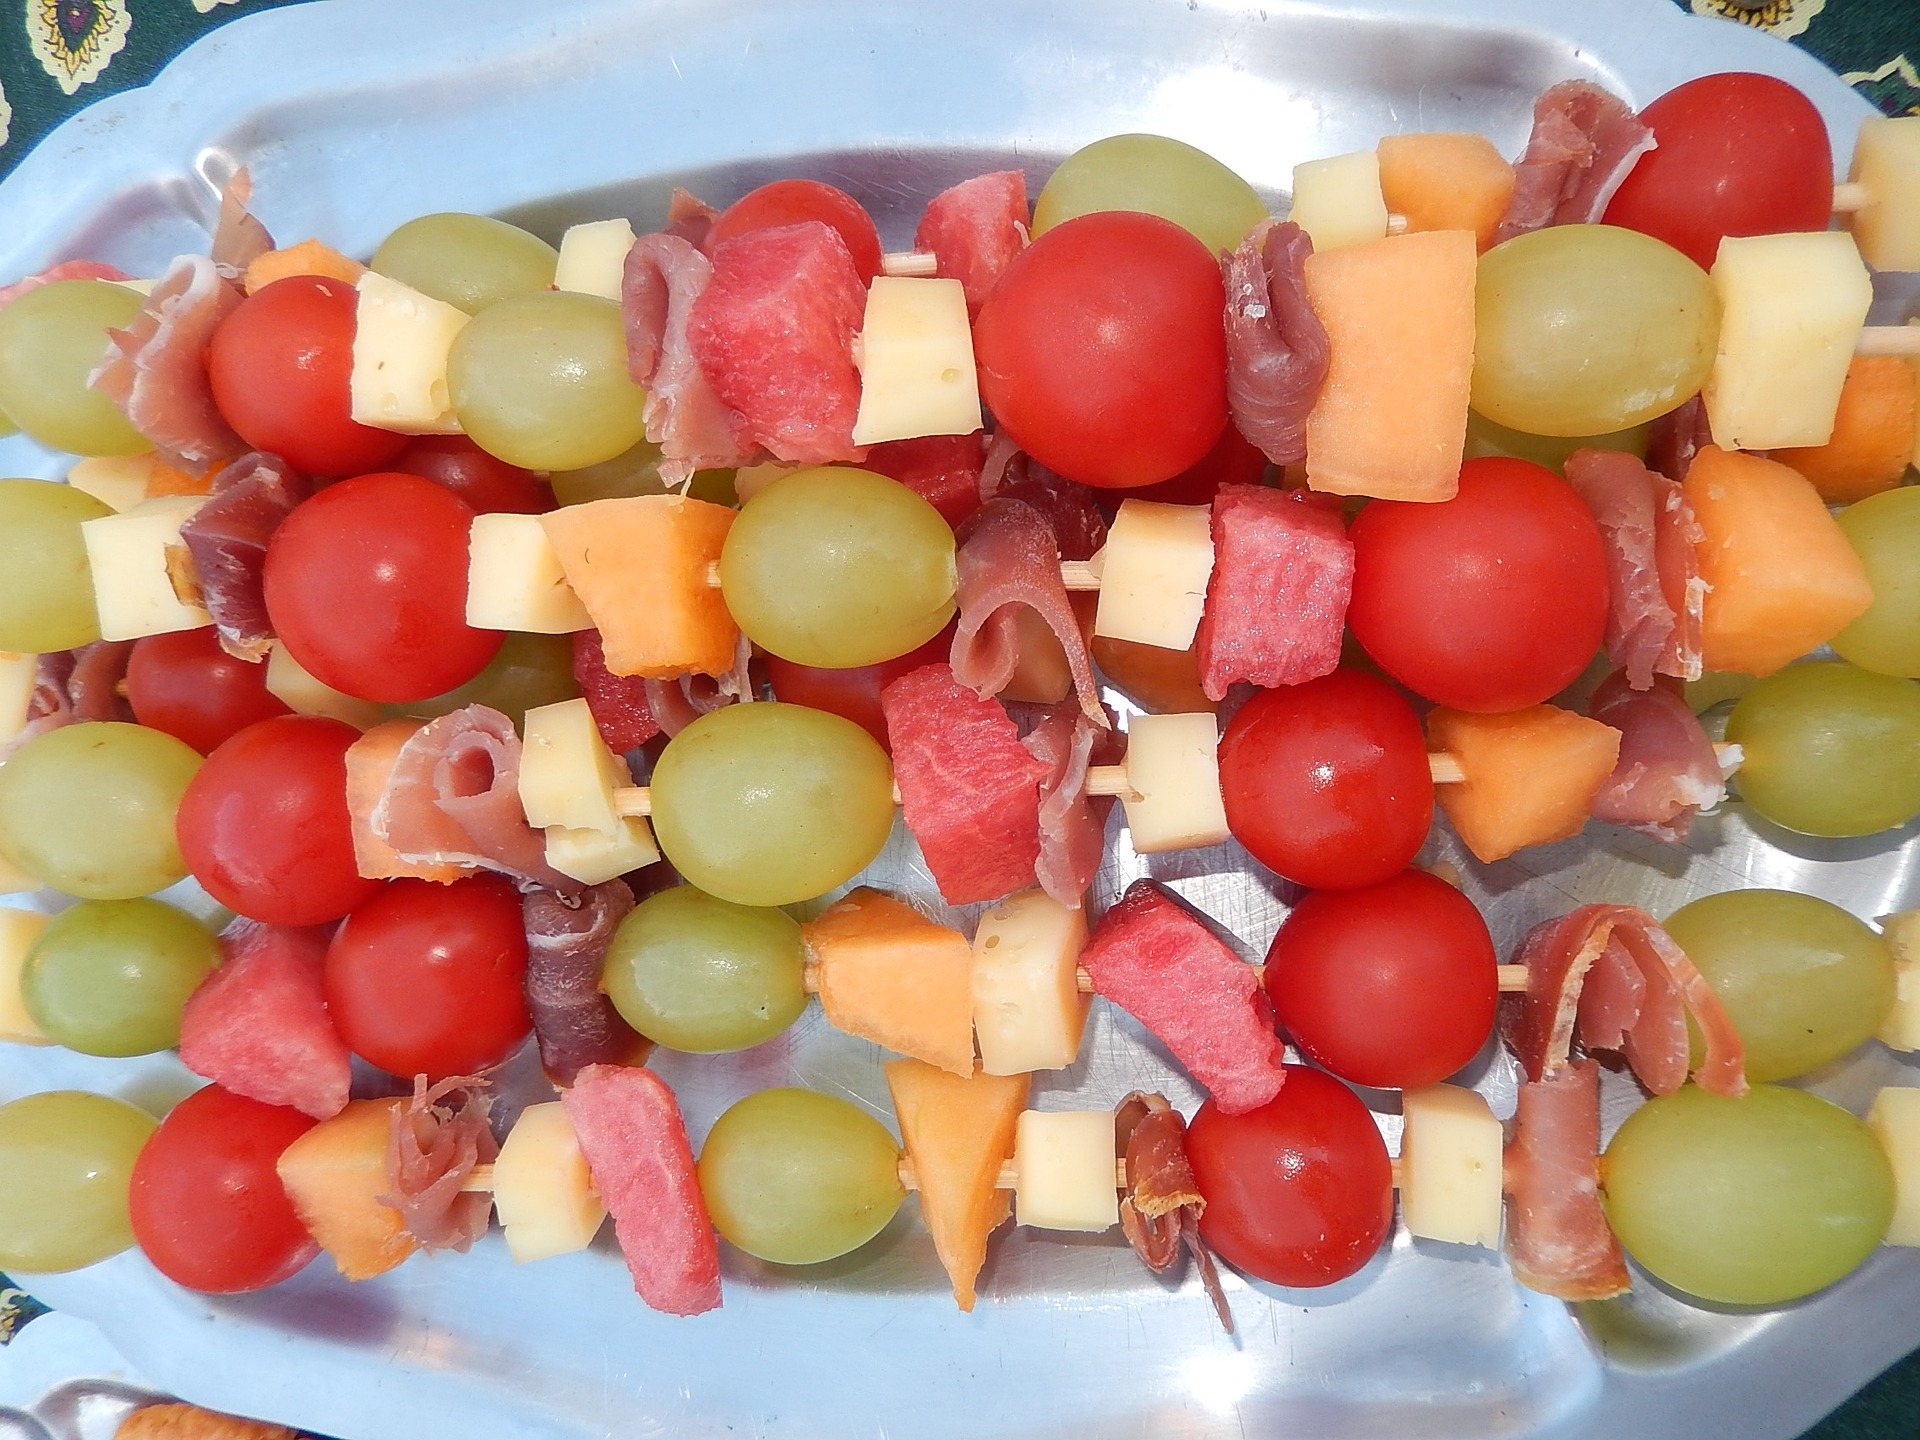 frutas acarameladas a la parrilla